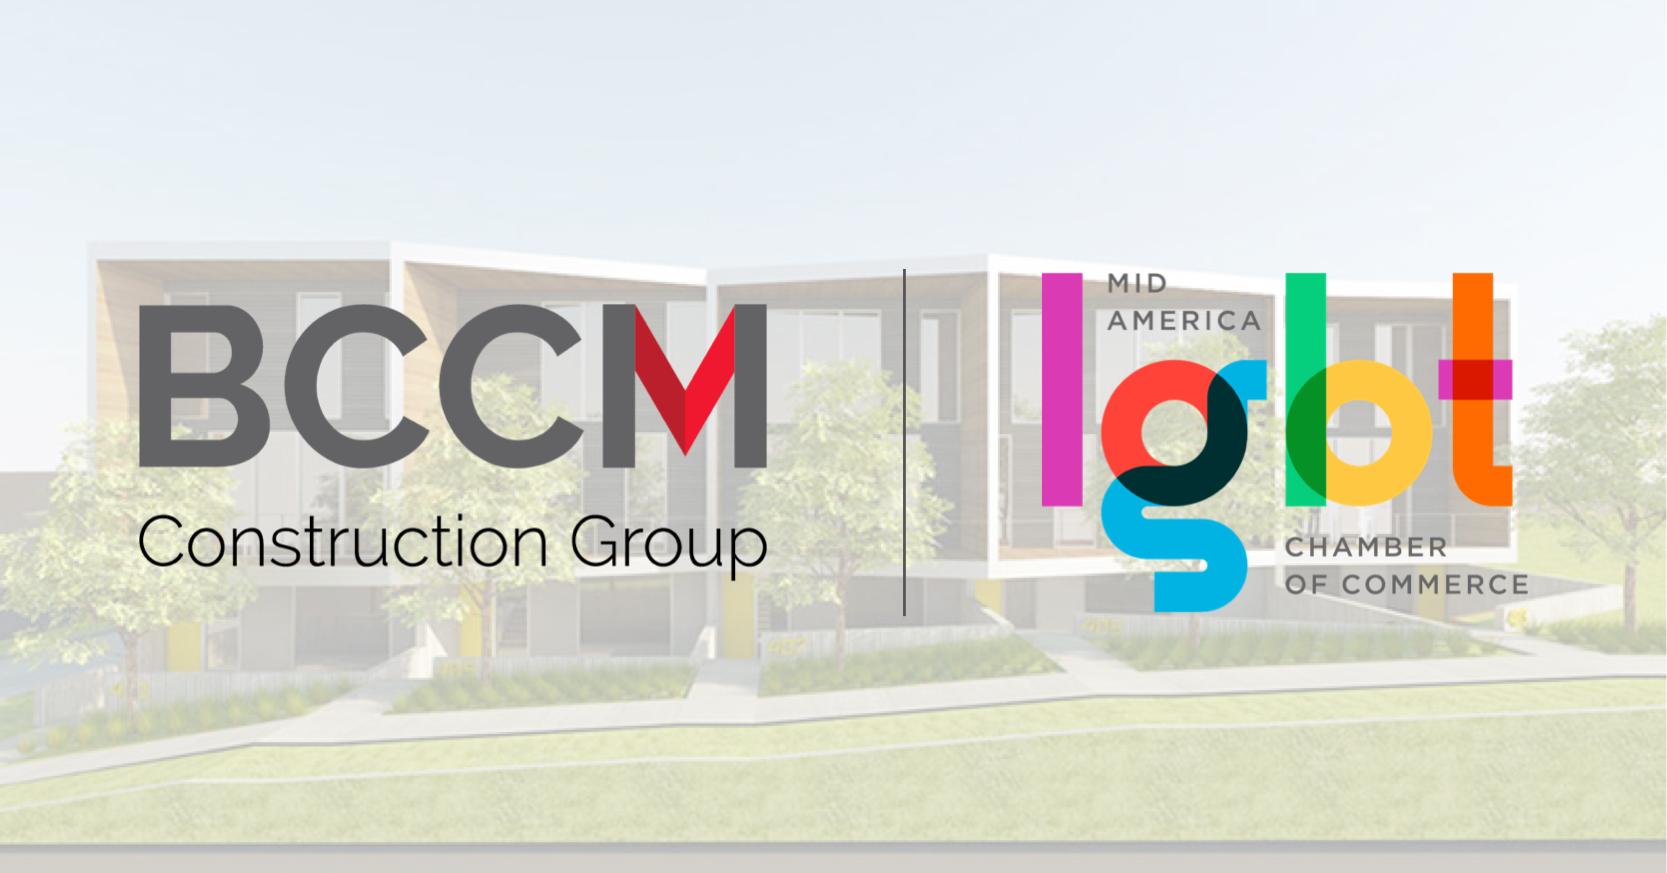 midamerica_lgbt-new_member-bccm_construction2